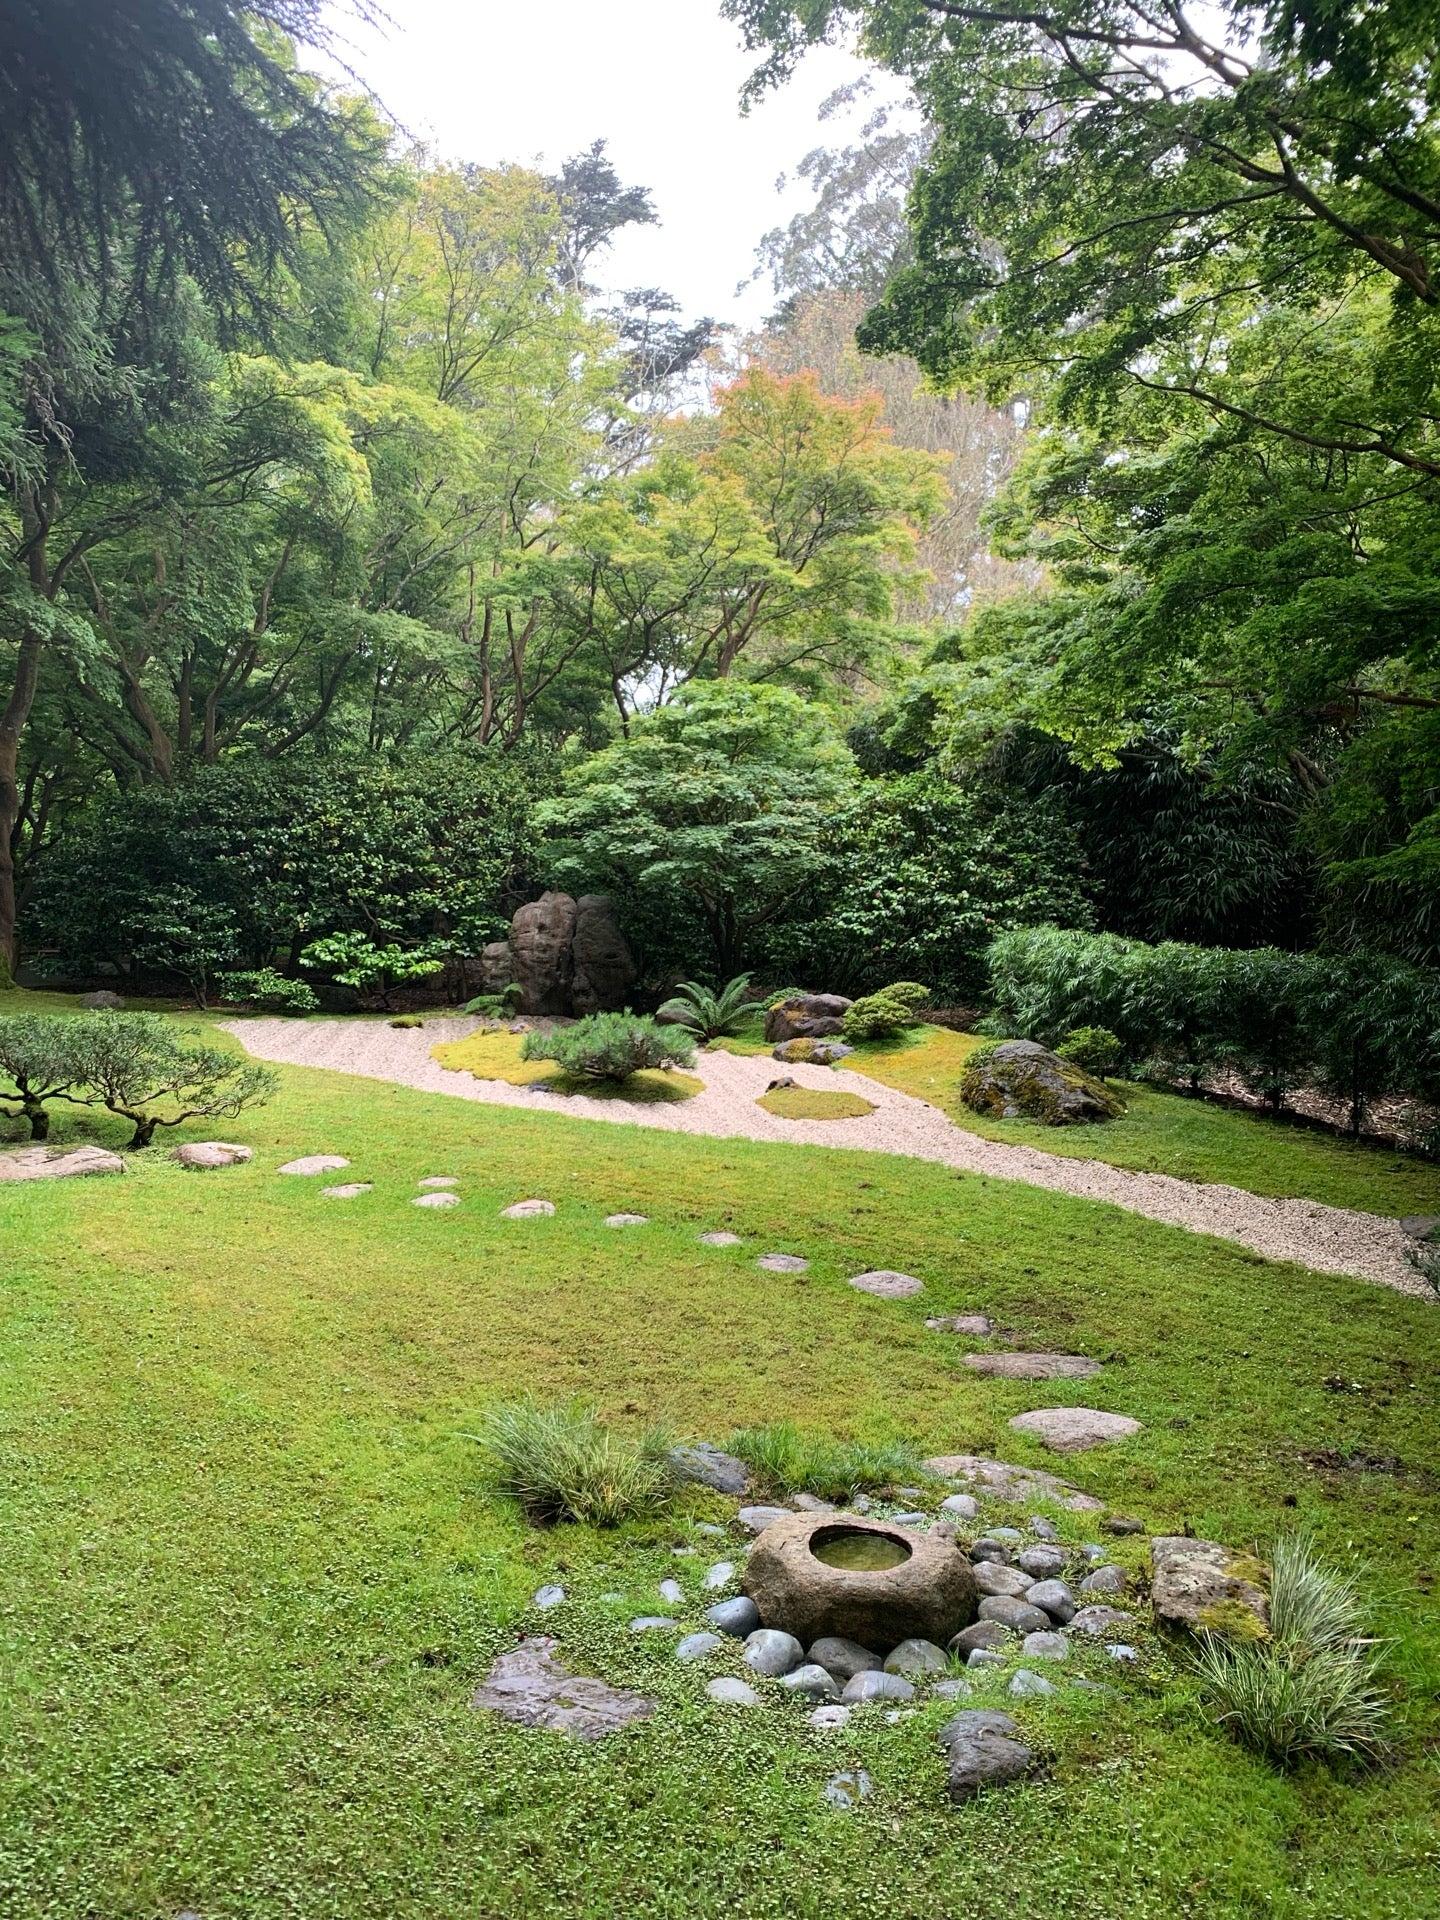 Checked in at Japanese Tea Garden